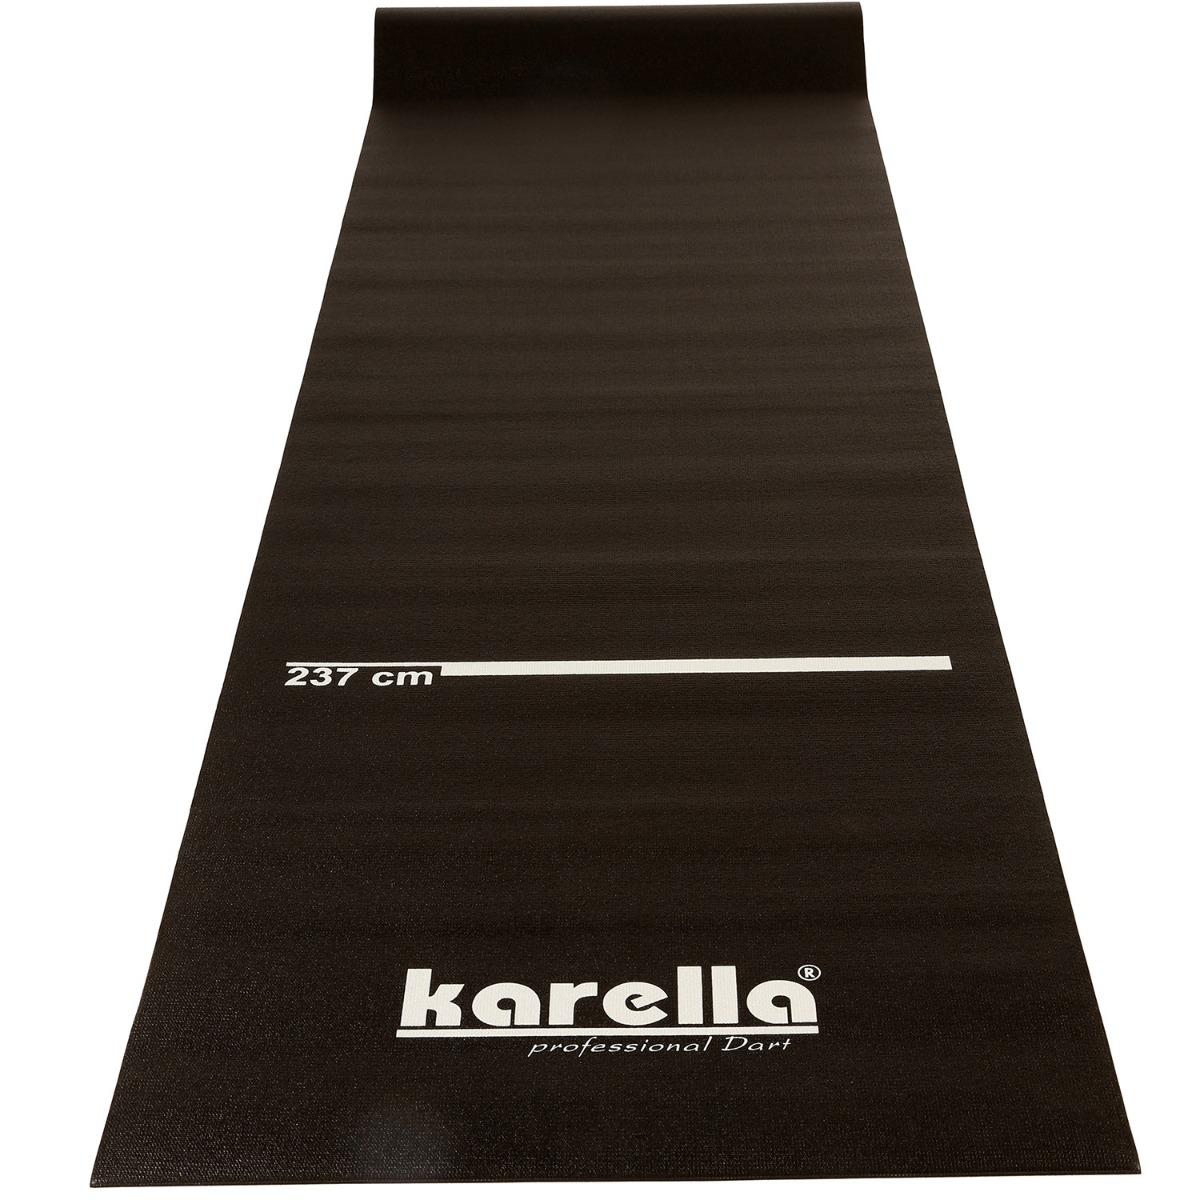 Karella Eco Star